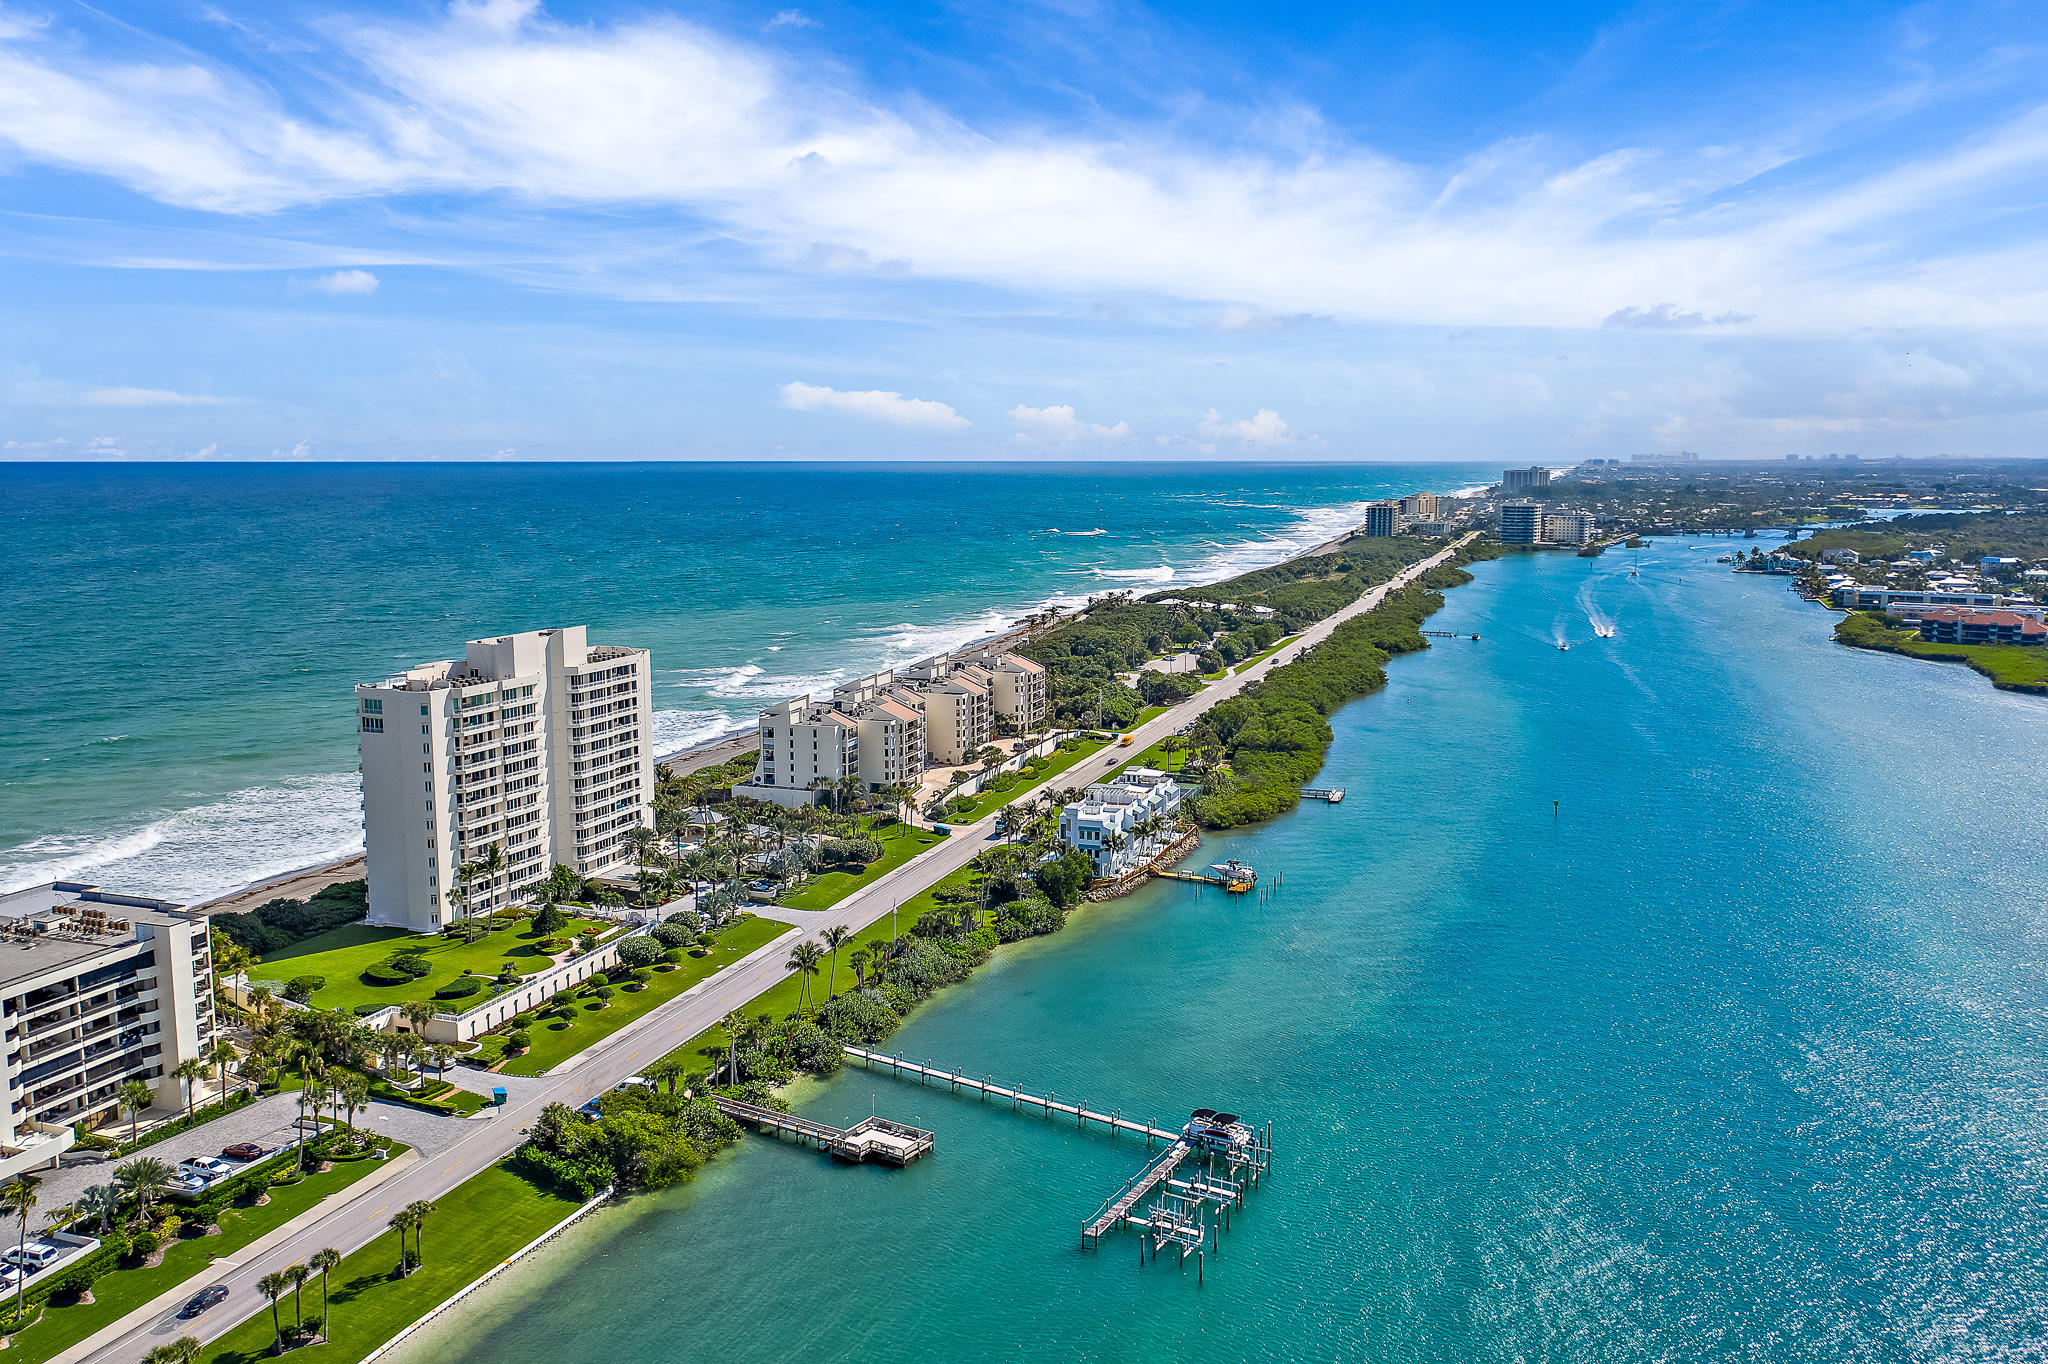 19700 Beach Road 6s, Jupiter, Florida 33469, 4 Bedrooms Bedrooms, ,5.1 BathroomsBathrooms,A,Condominium,Beach,RX-10610571